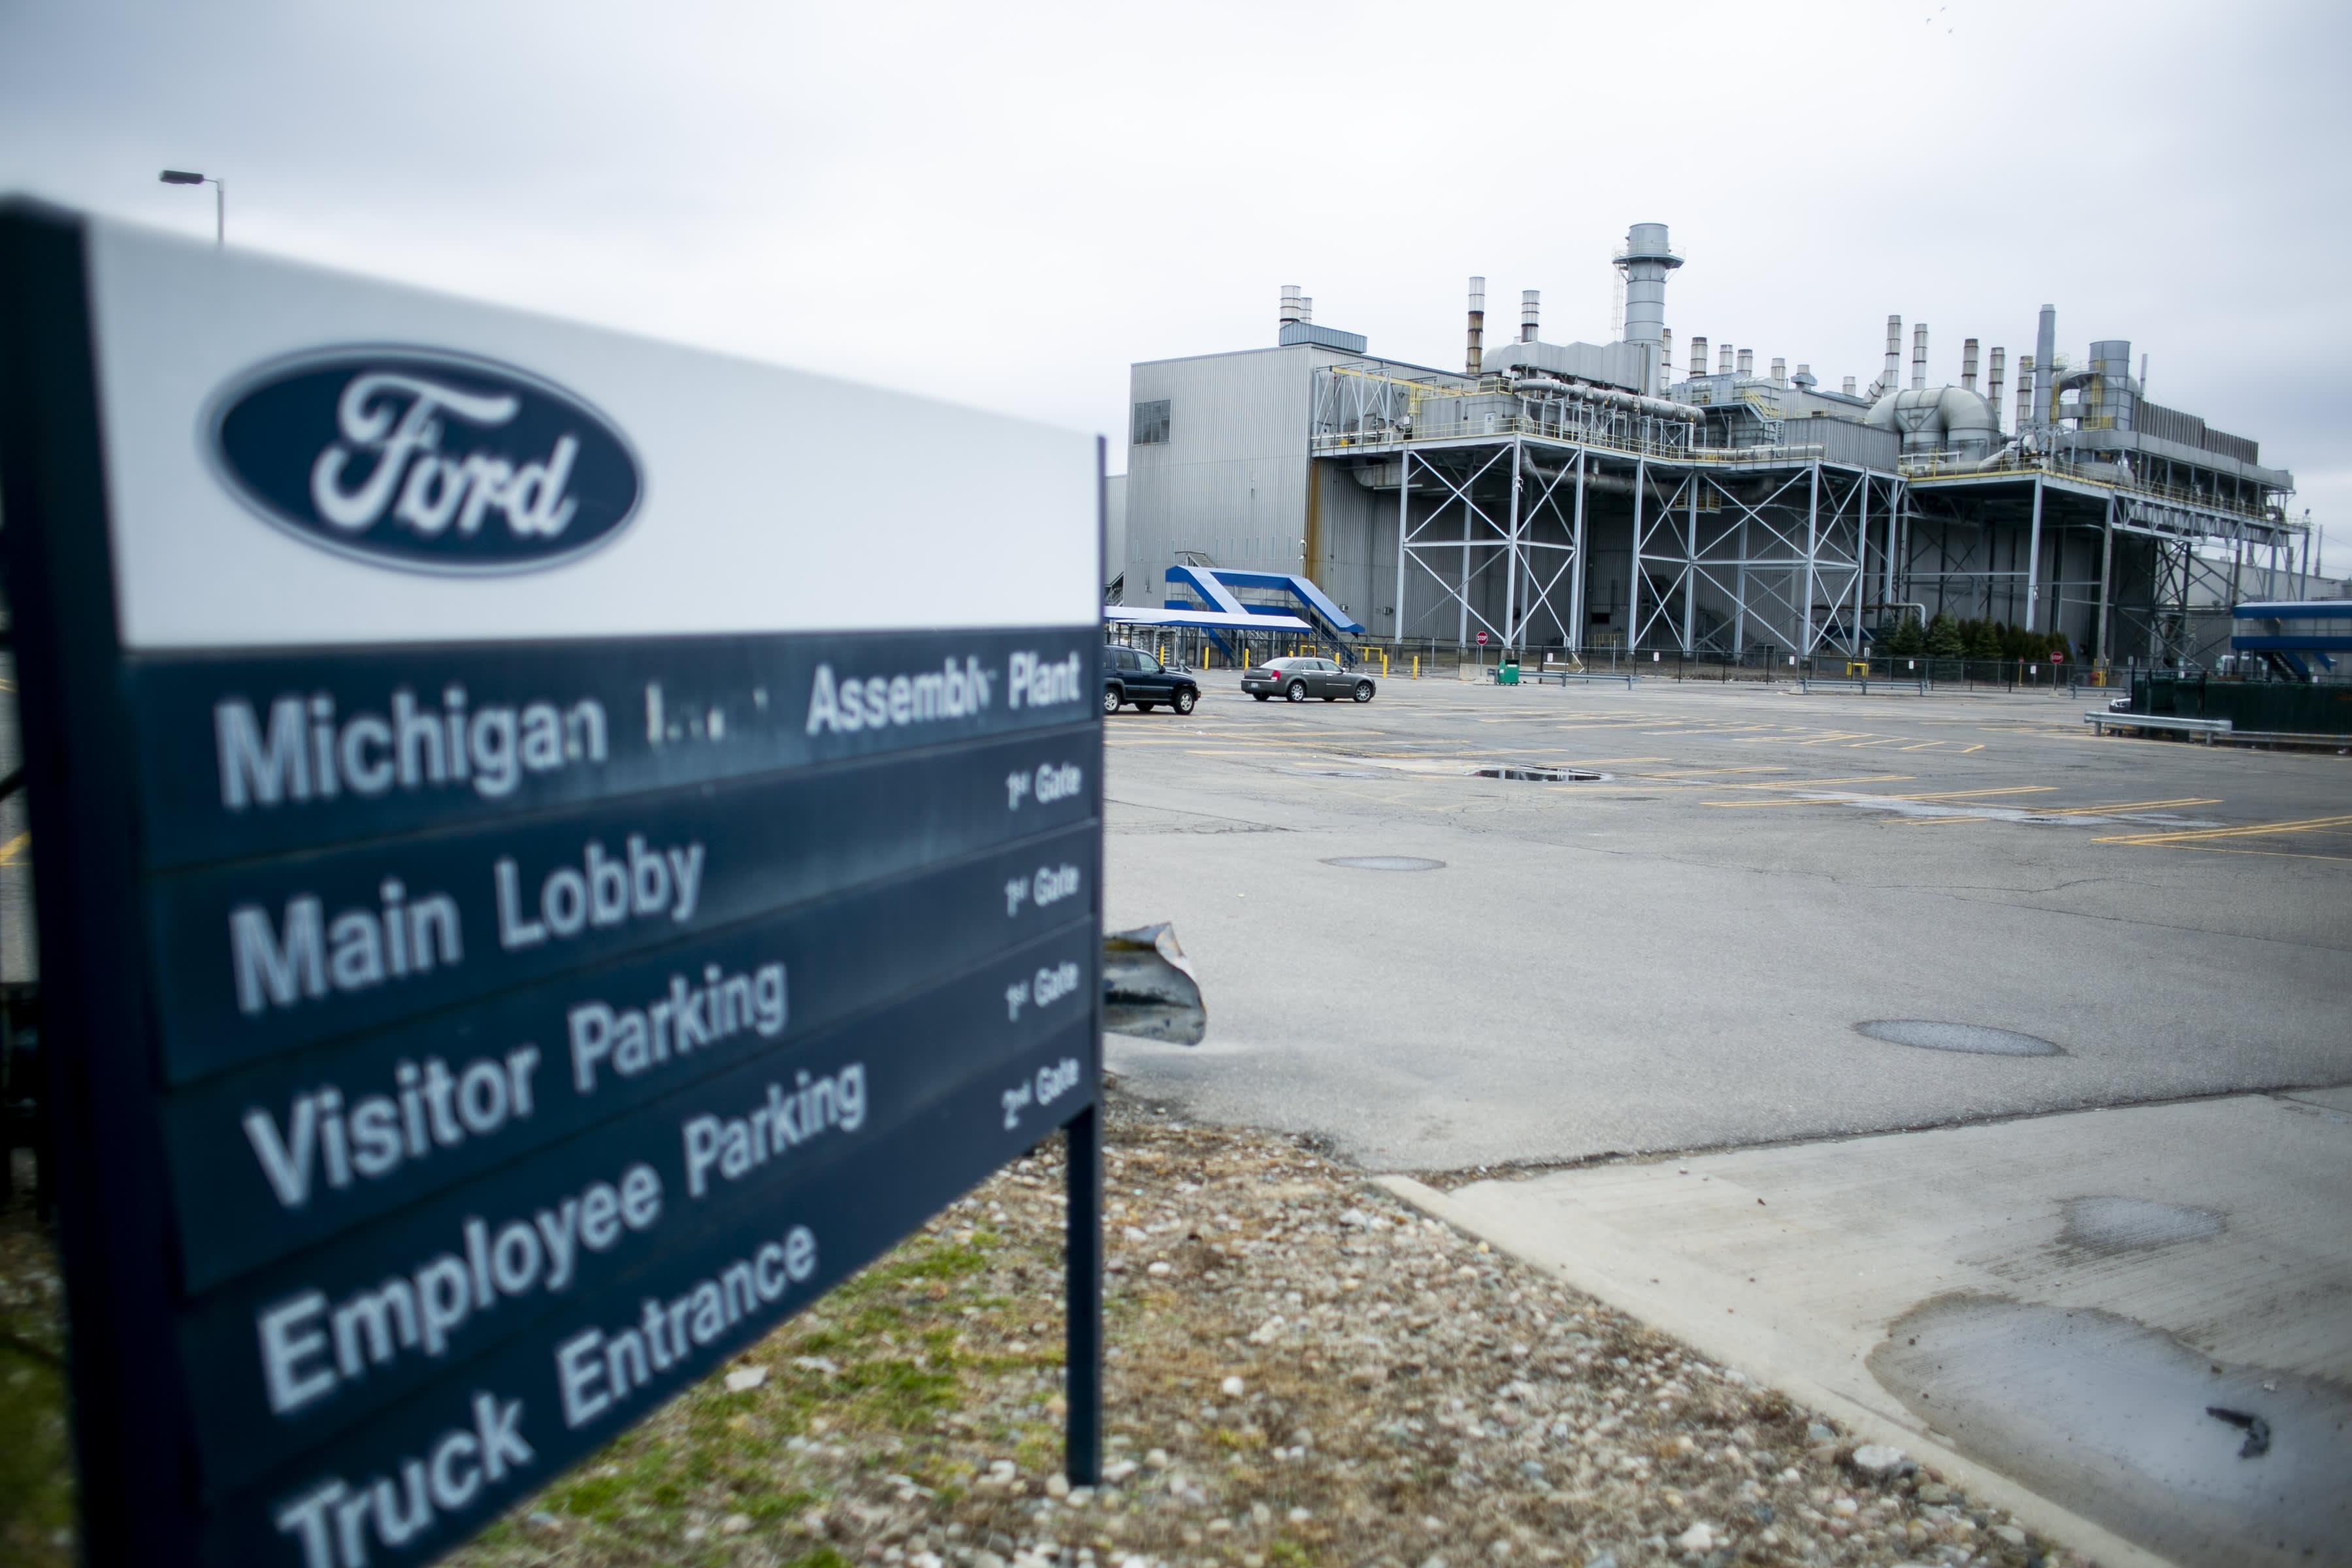 Ford postpones reopening 'key' plants due to coronavirus pandemic - CNBC